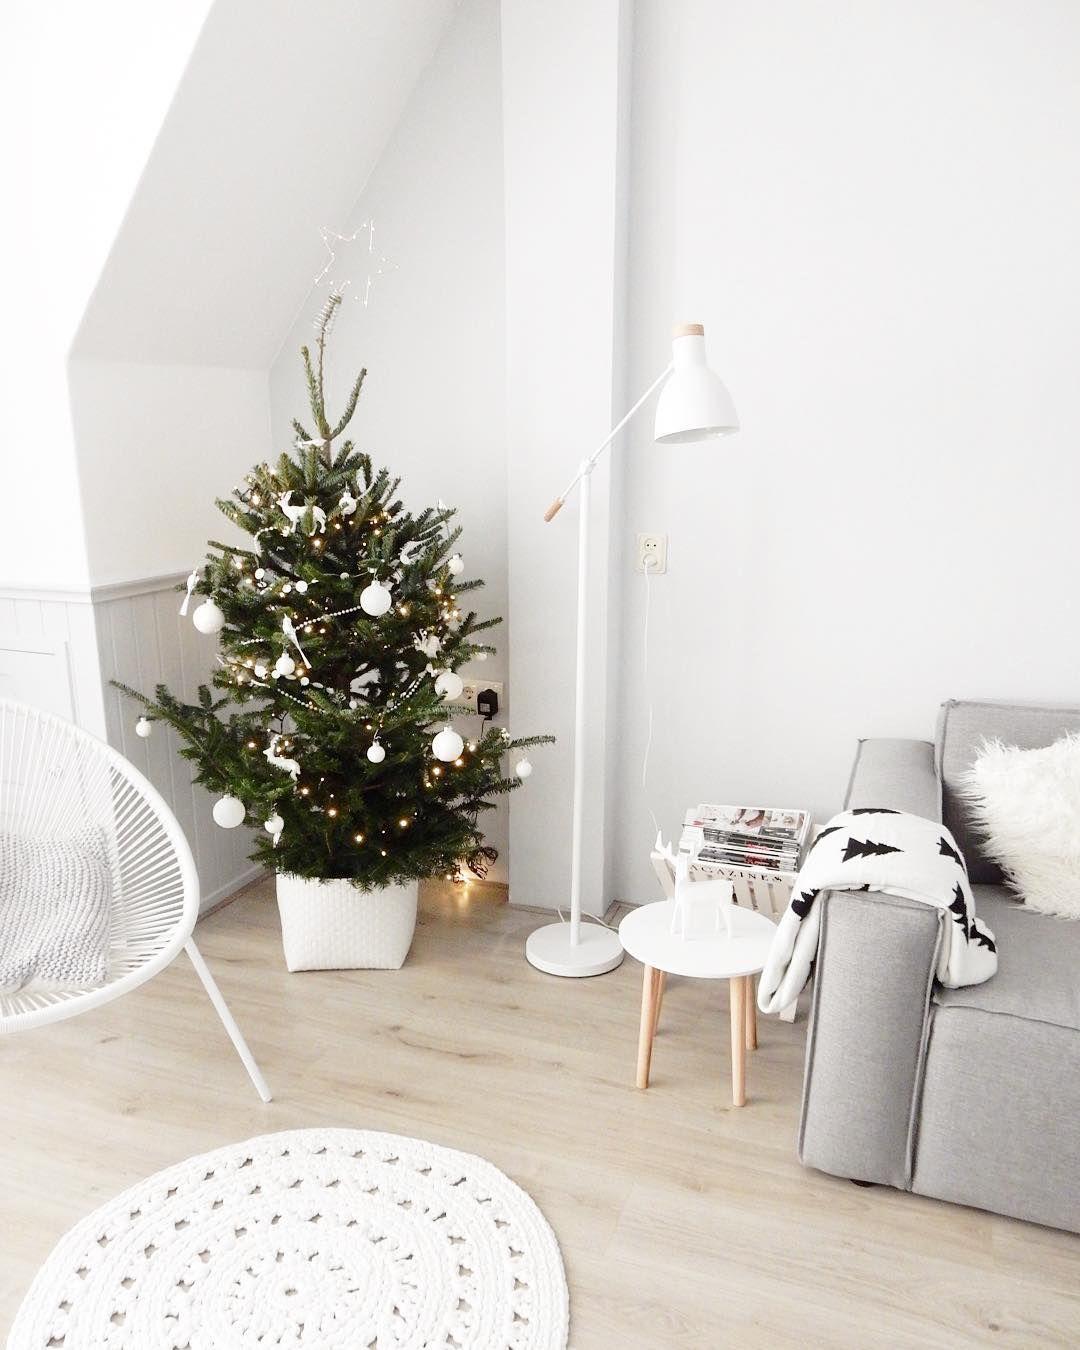 Meijer Home Decor: Pin Van Charlotte Meijer Op Woonkamer